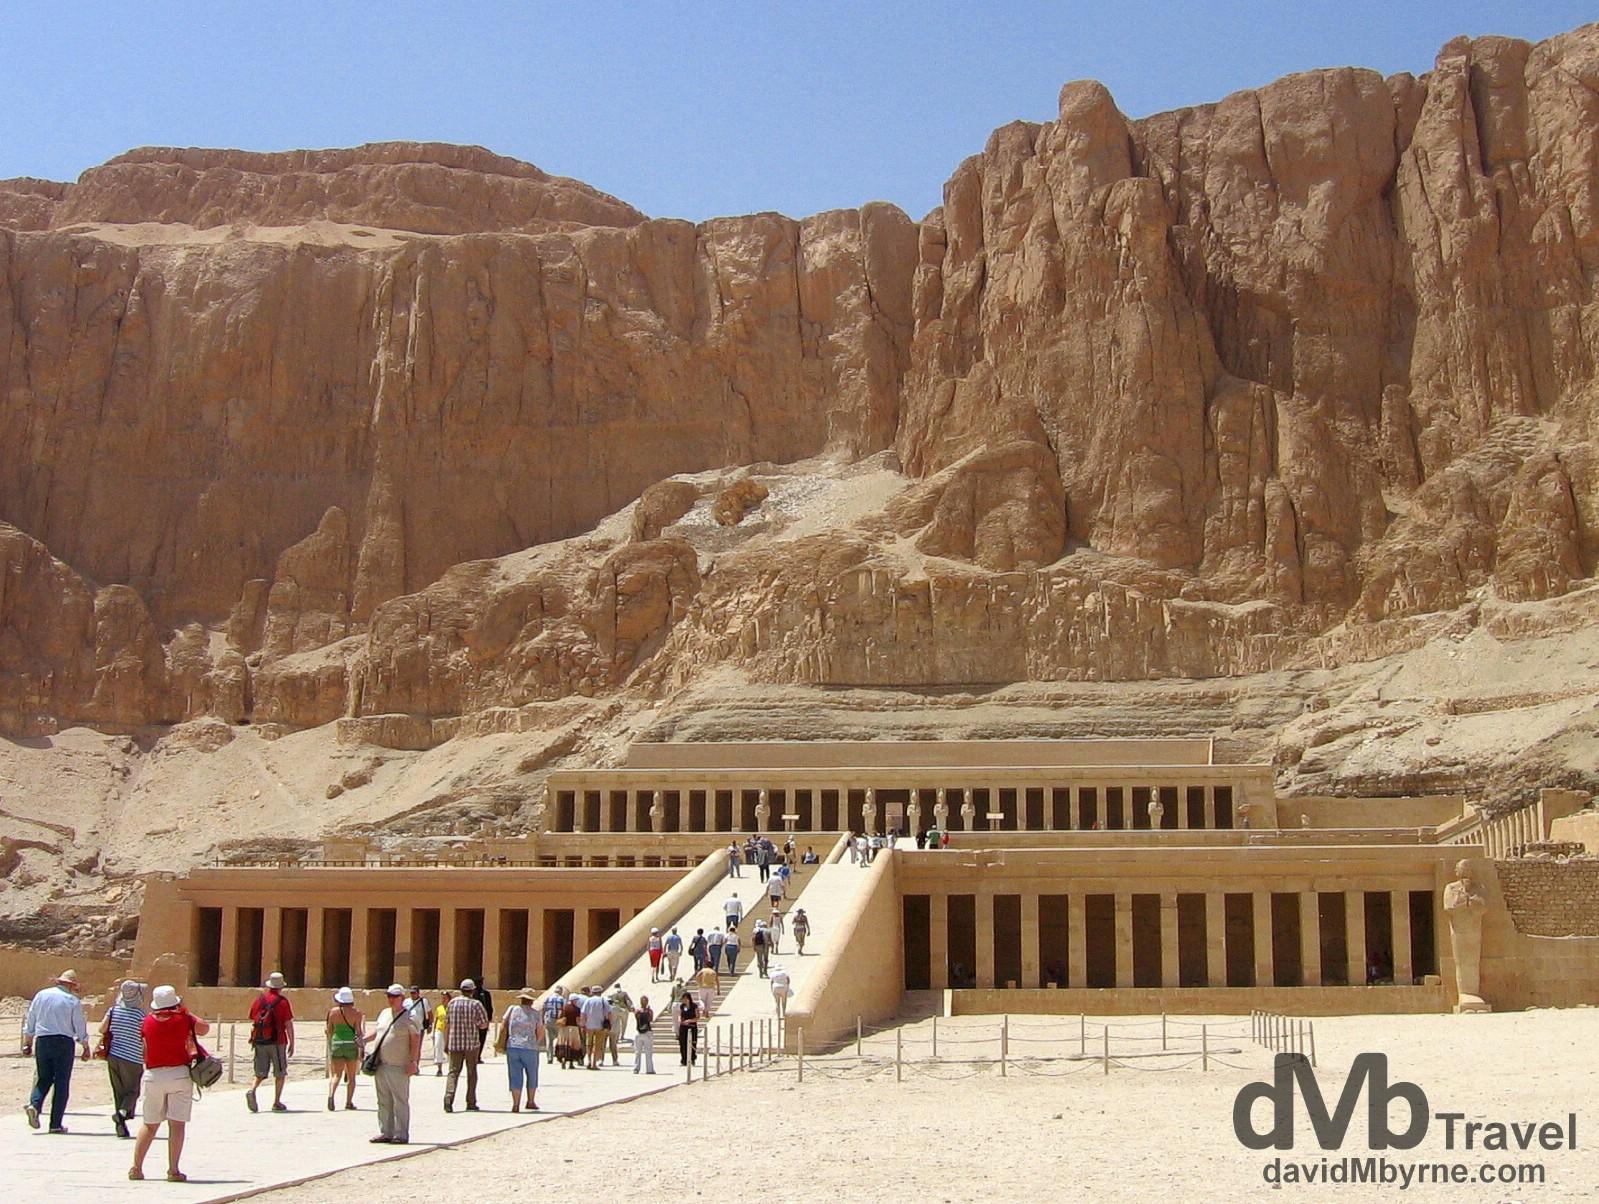 The Funerary Temple of Hatshepsut Luxor, Egypt